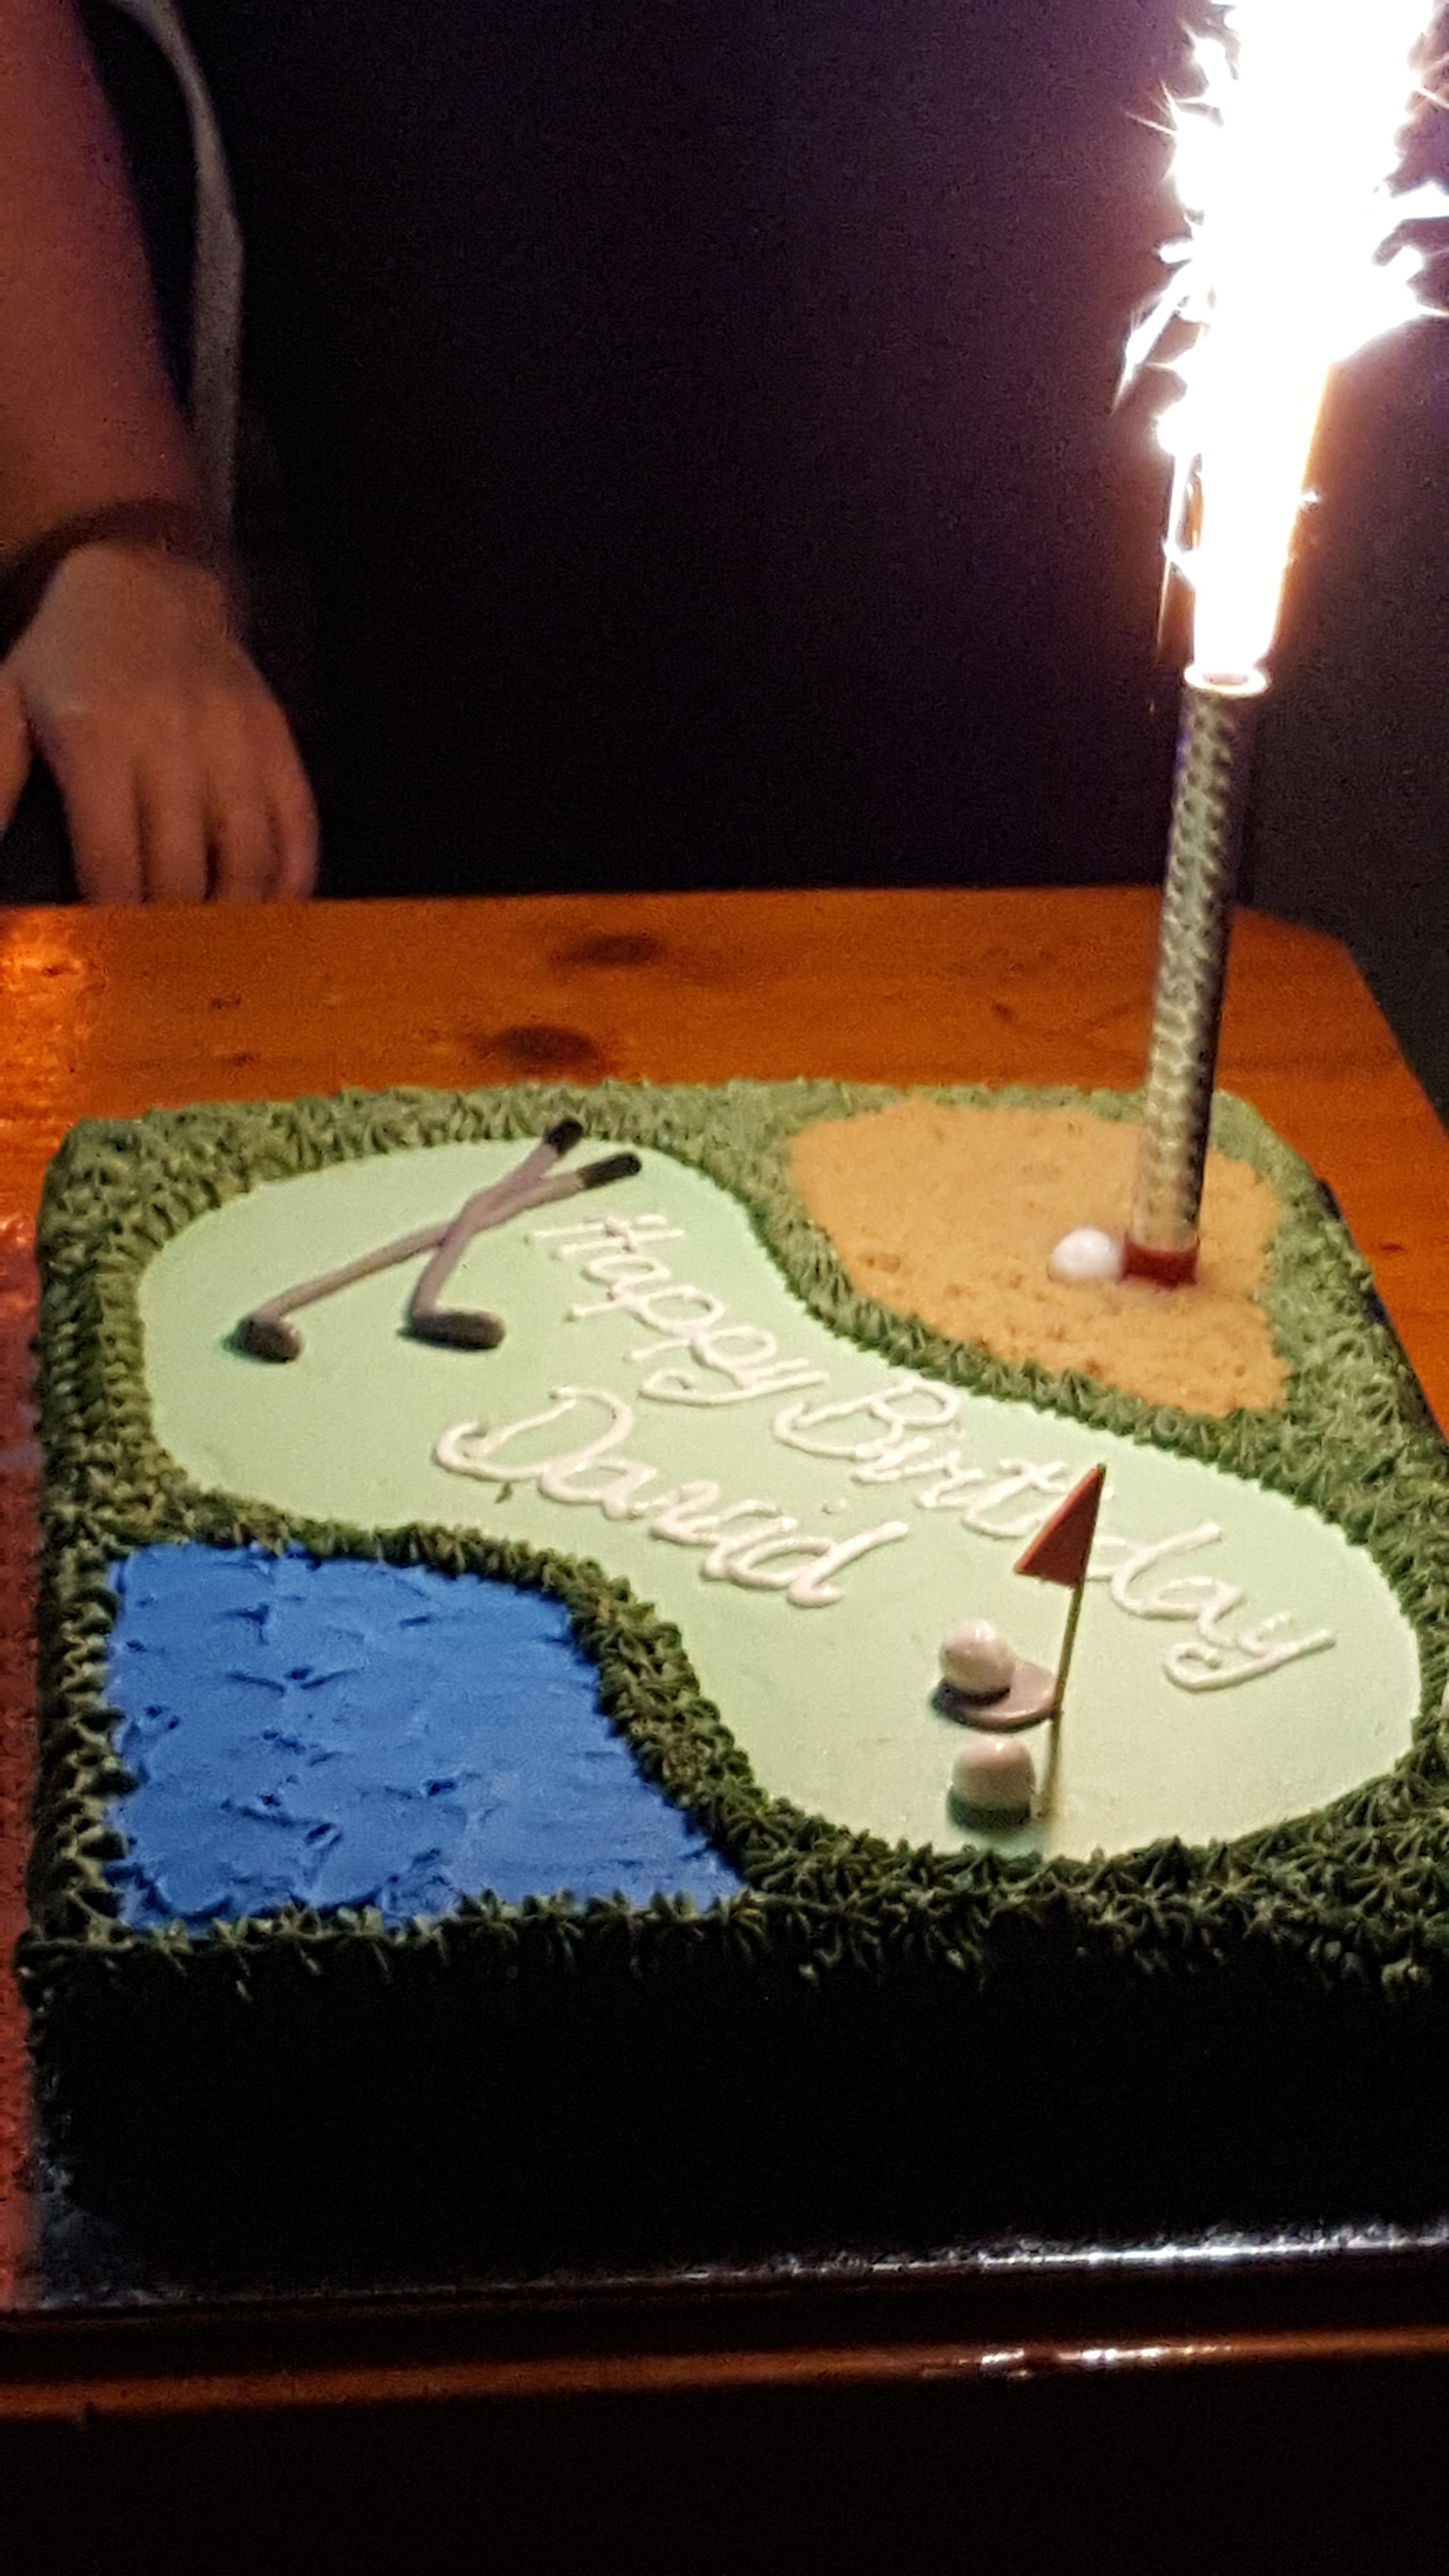 My buddy's bday cake http://bit.ly/1tqbxvk